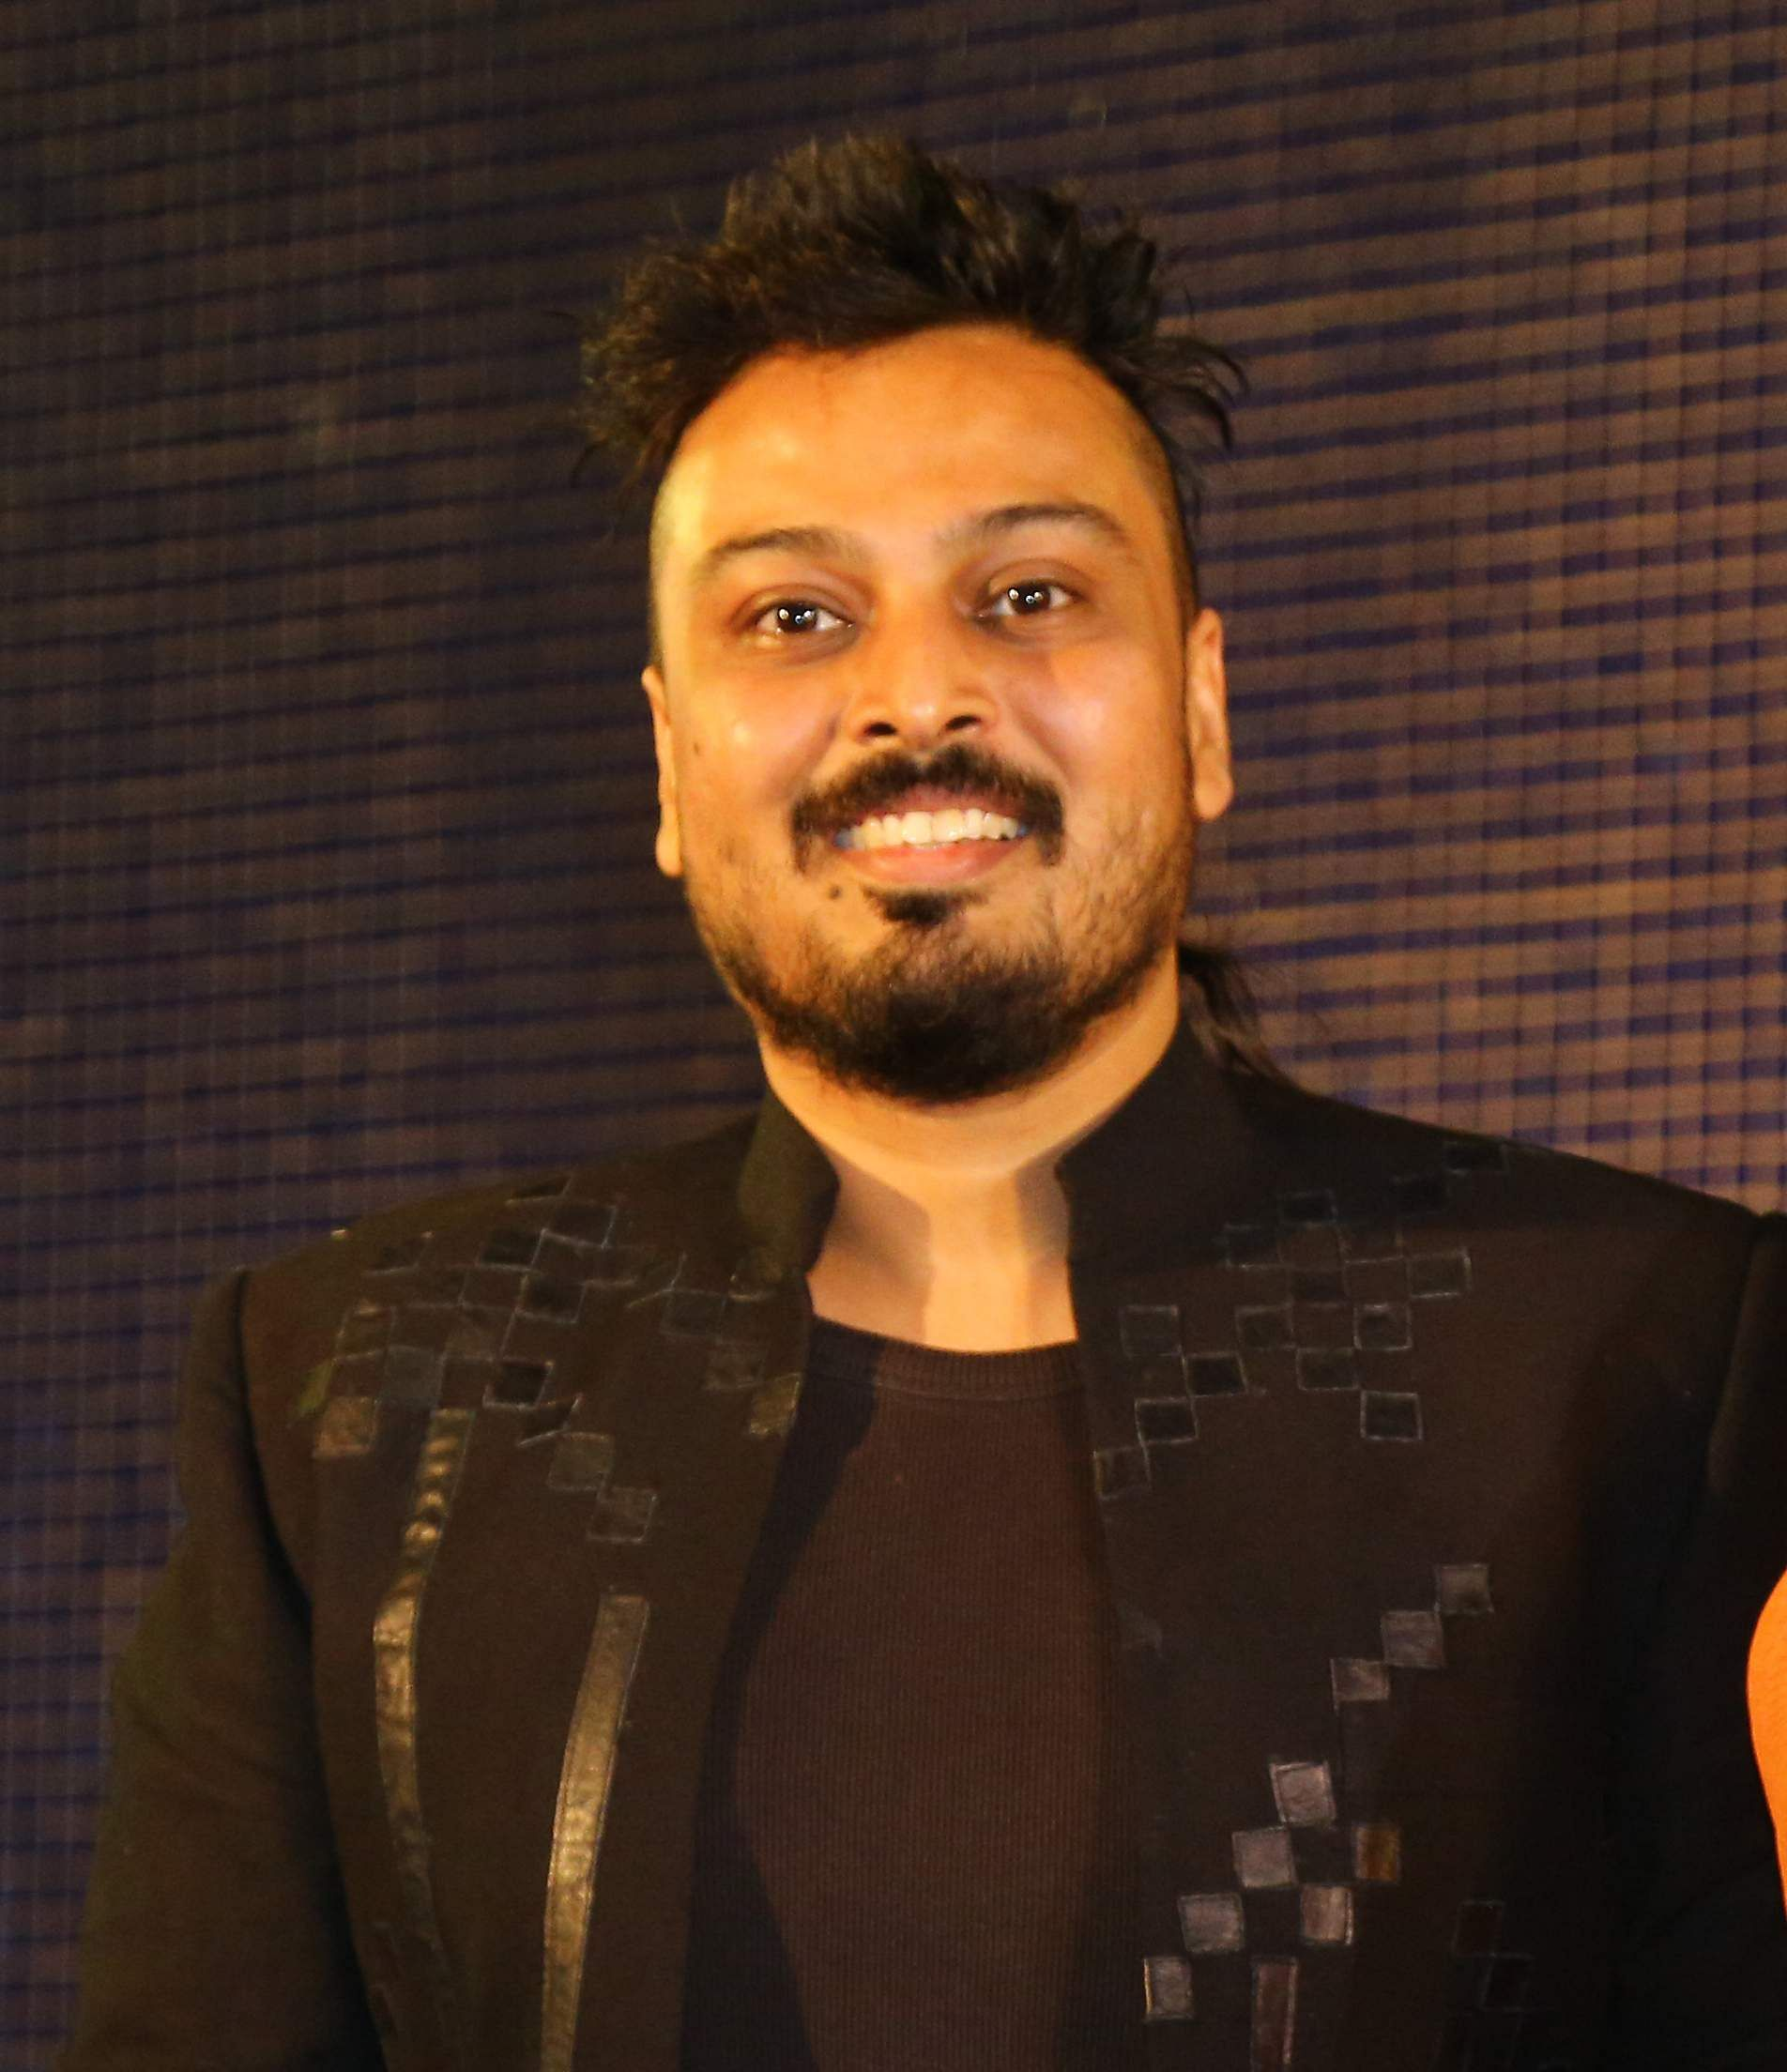 Kolkata Based Designer Abhishek Dutta Completes 15 Years In Fashion Industry